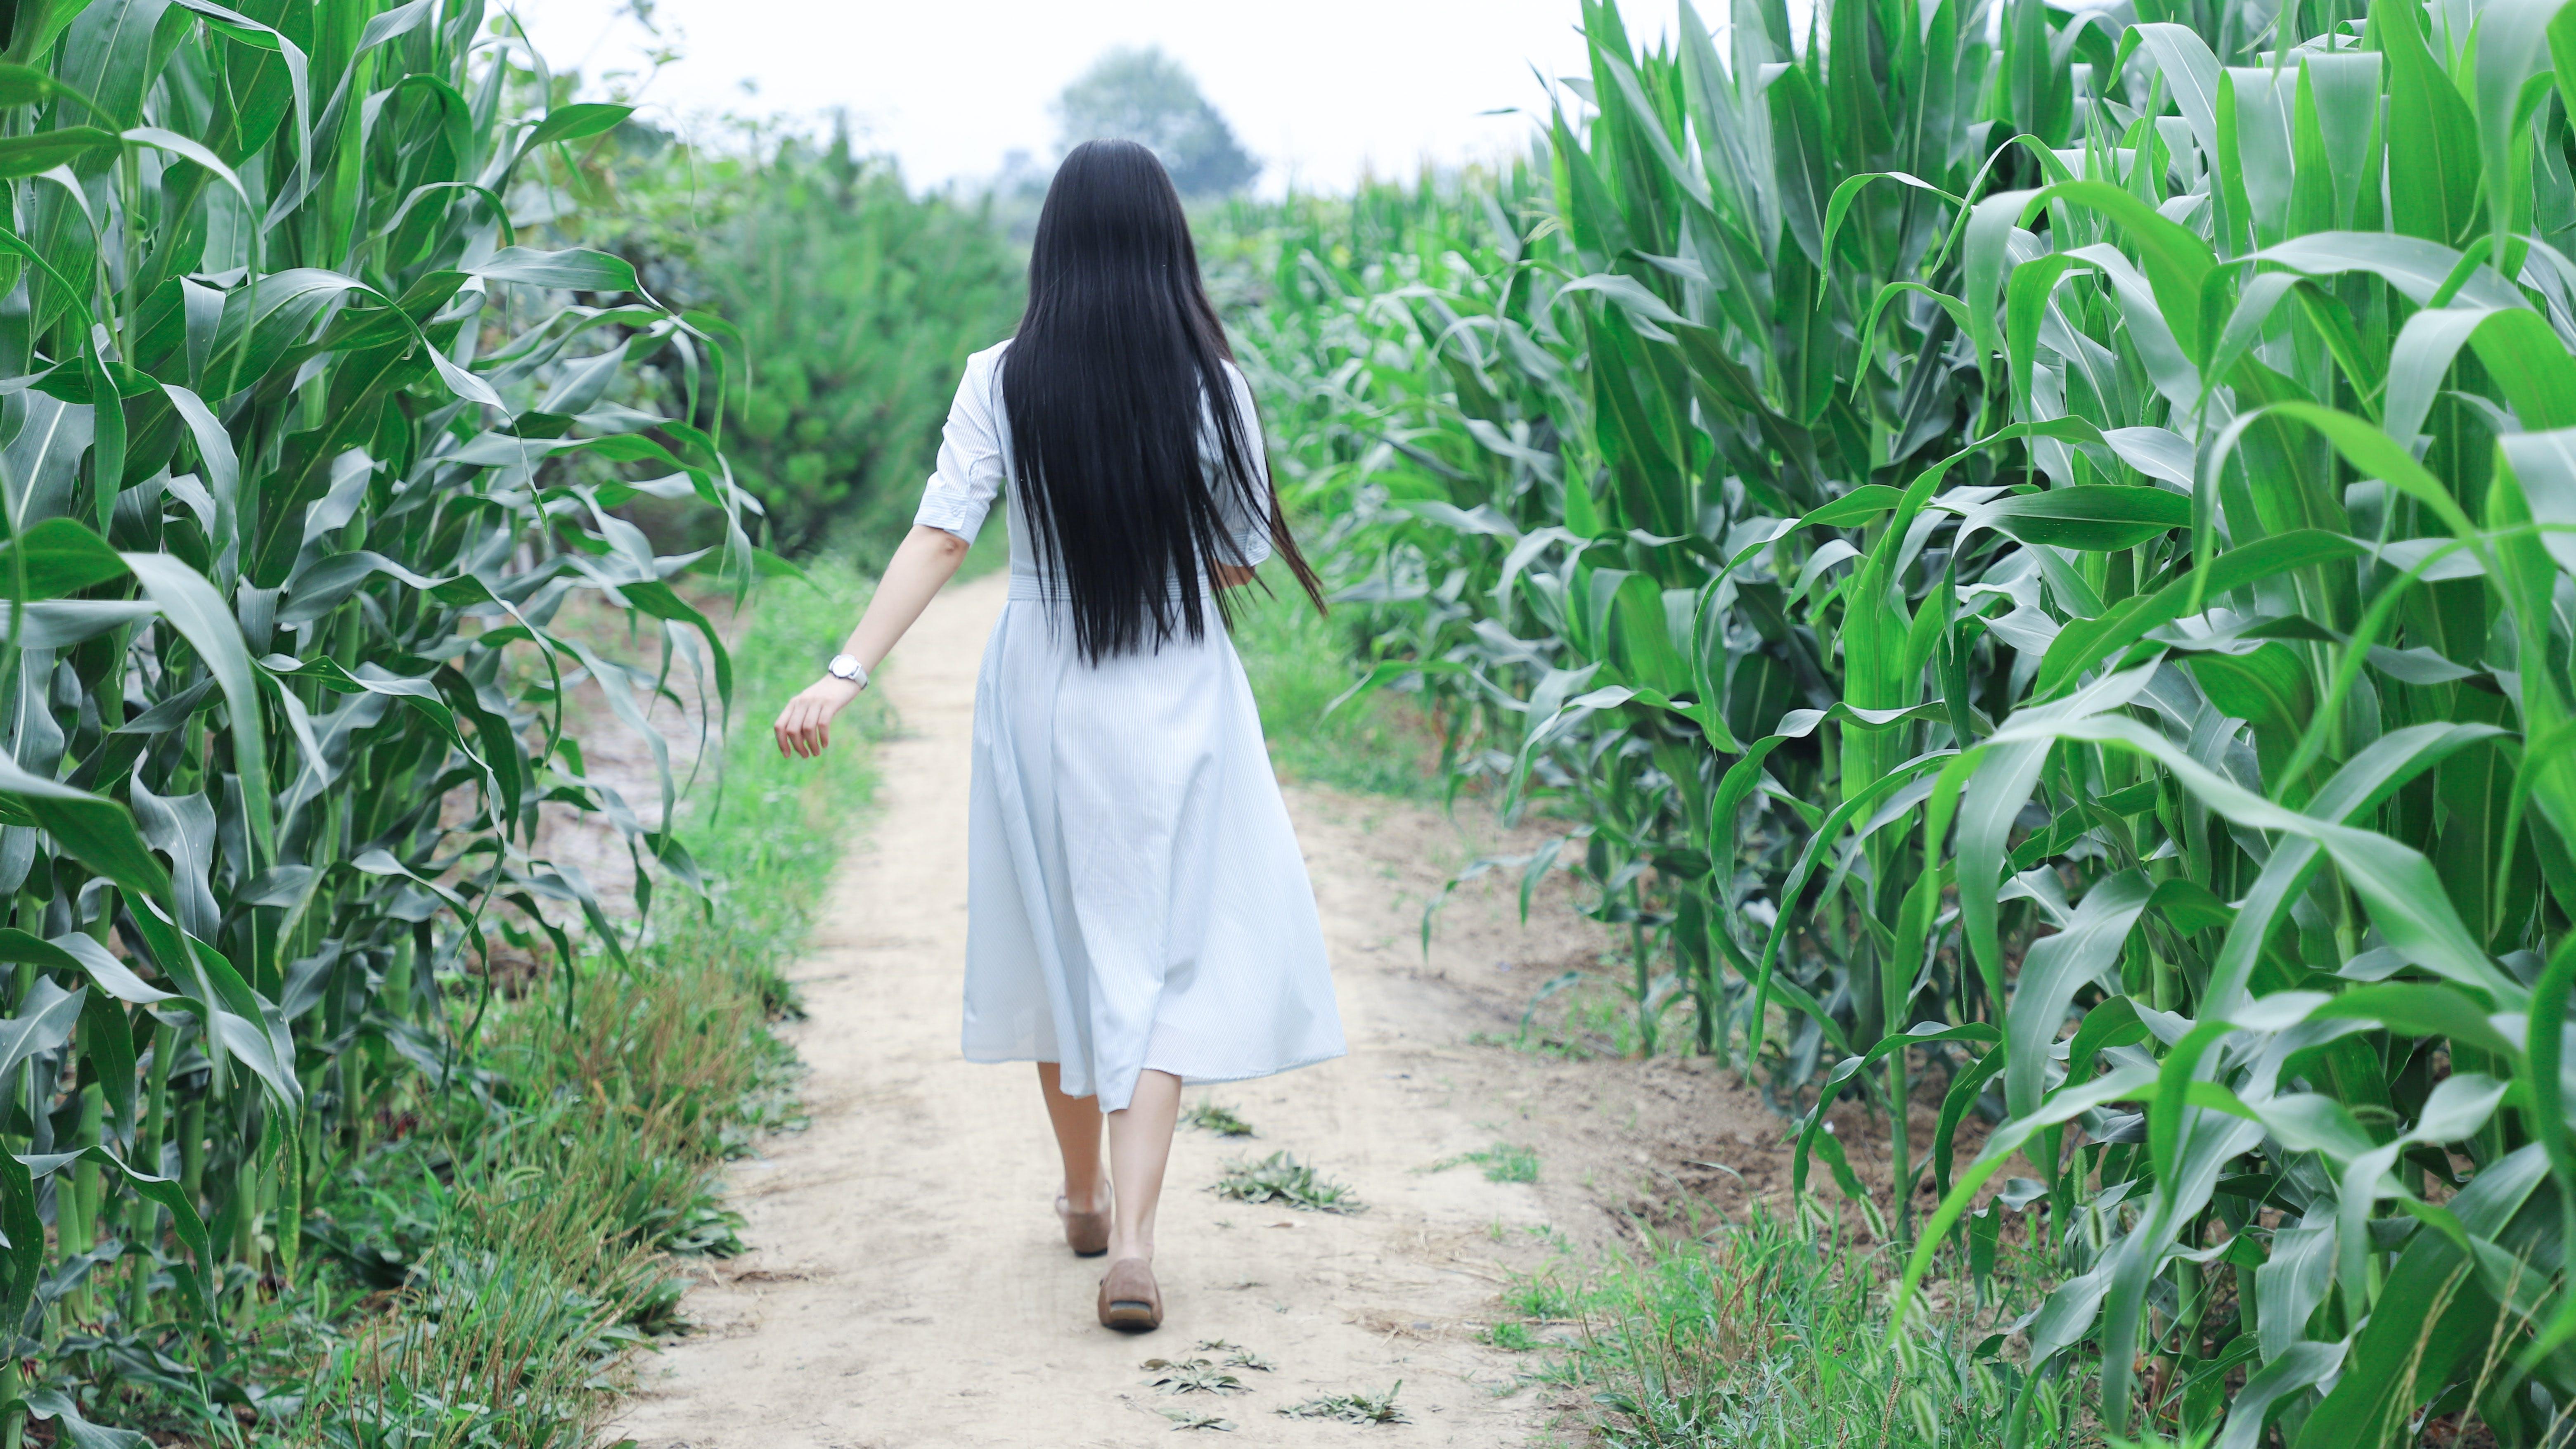 Foto stok gratis bidang, cewek, hijau, kaum wanita